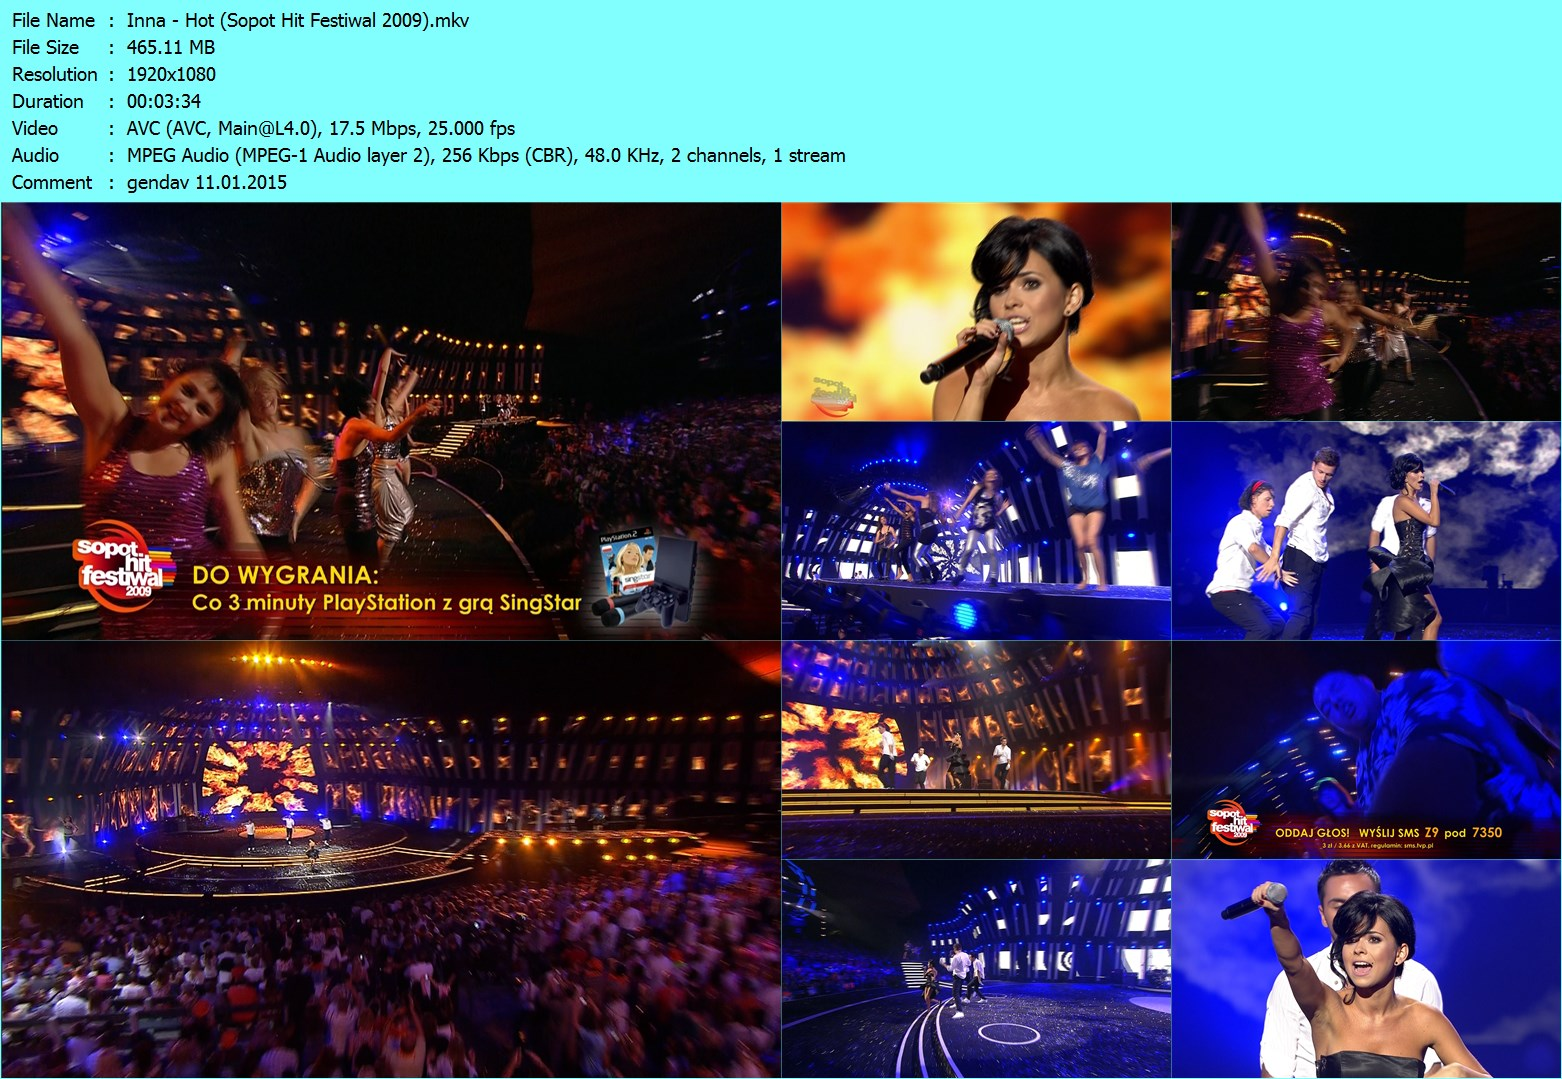 http://4put.ru/pictures/max/1061/3261156.jpg